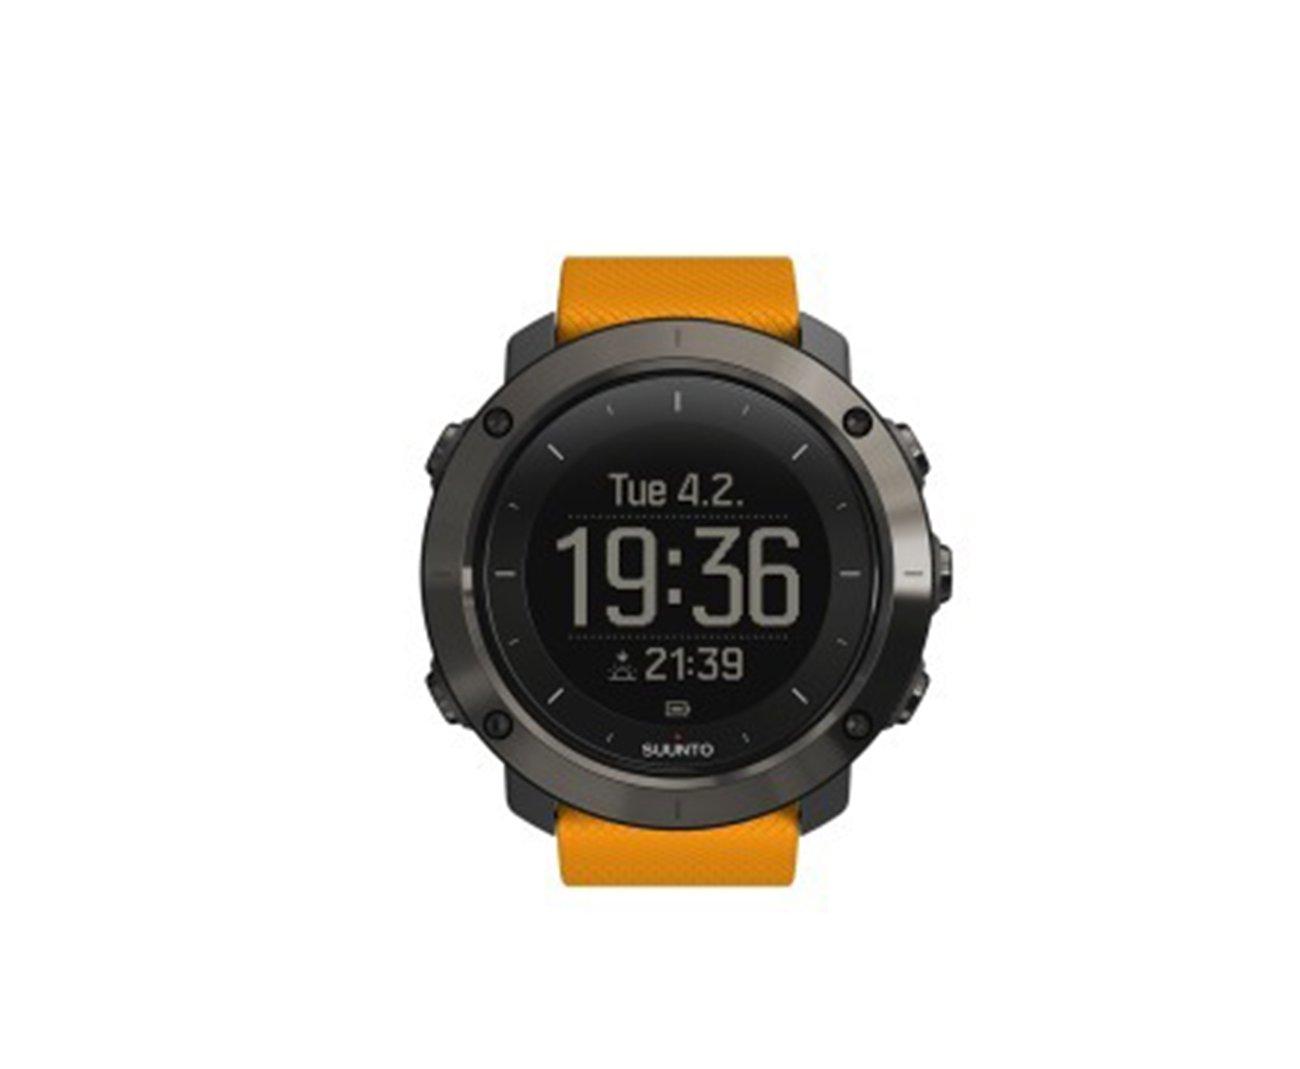 Relógio Amber Interface Com Pc E Apple - Sistema Gps E Glonass Integrado - Suunto